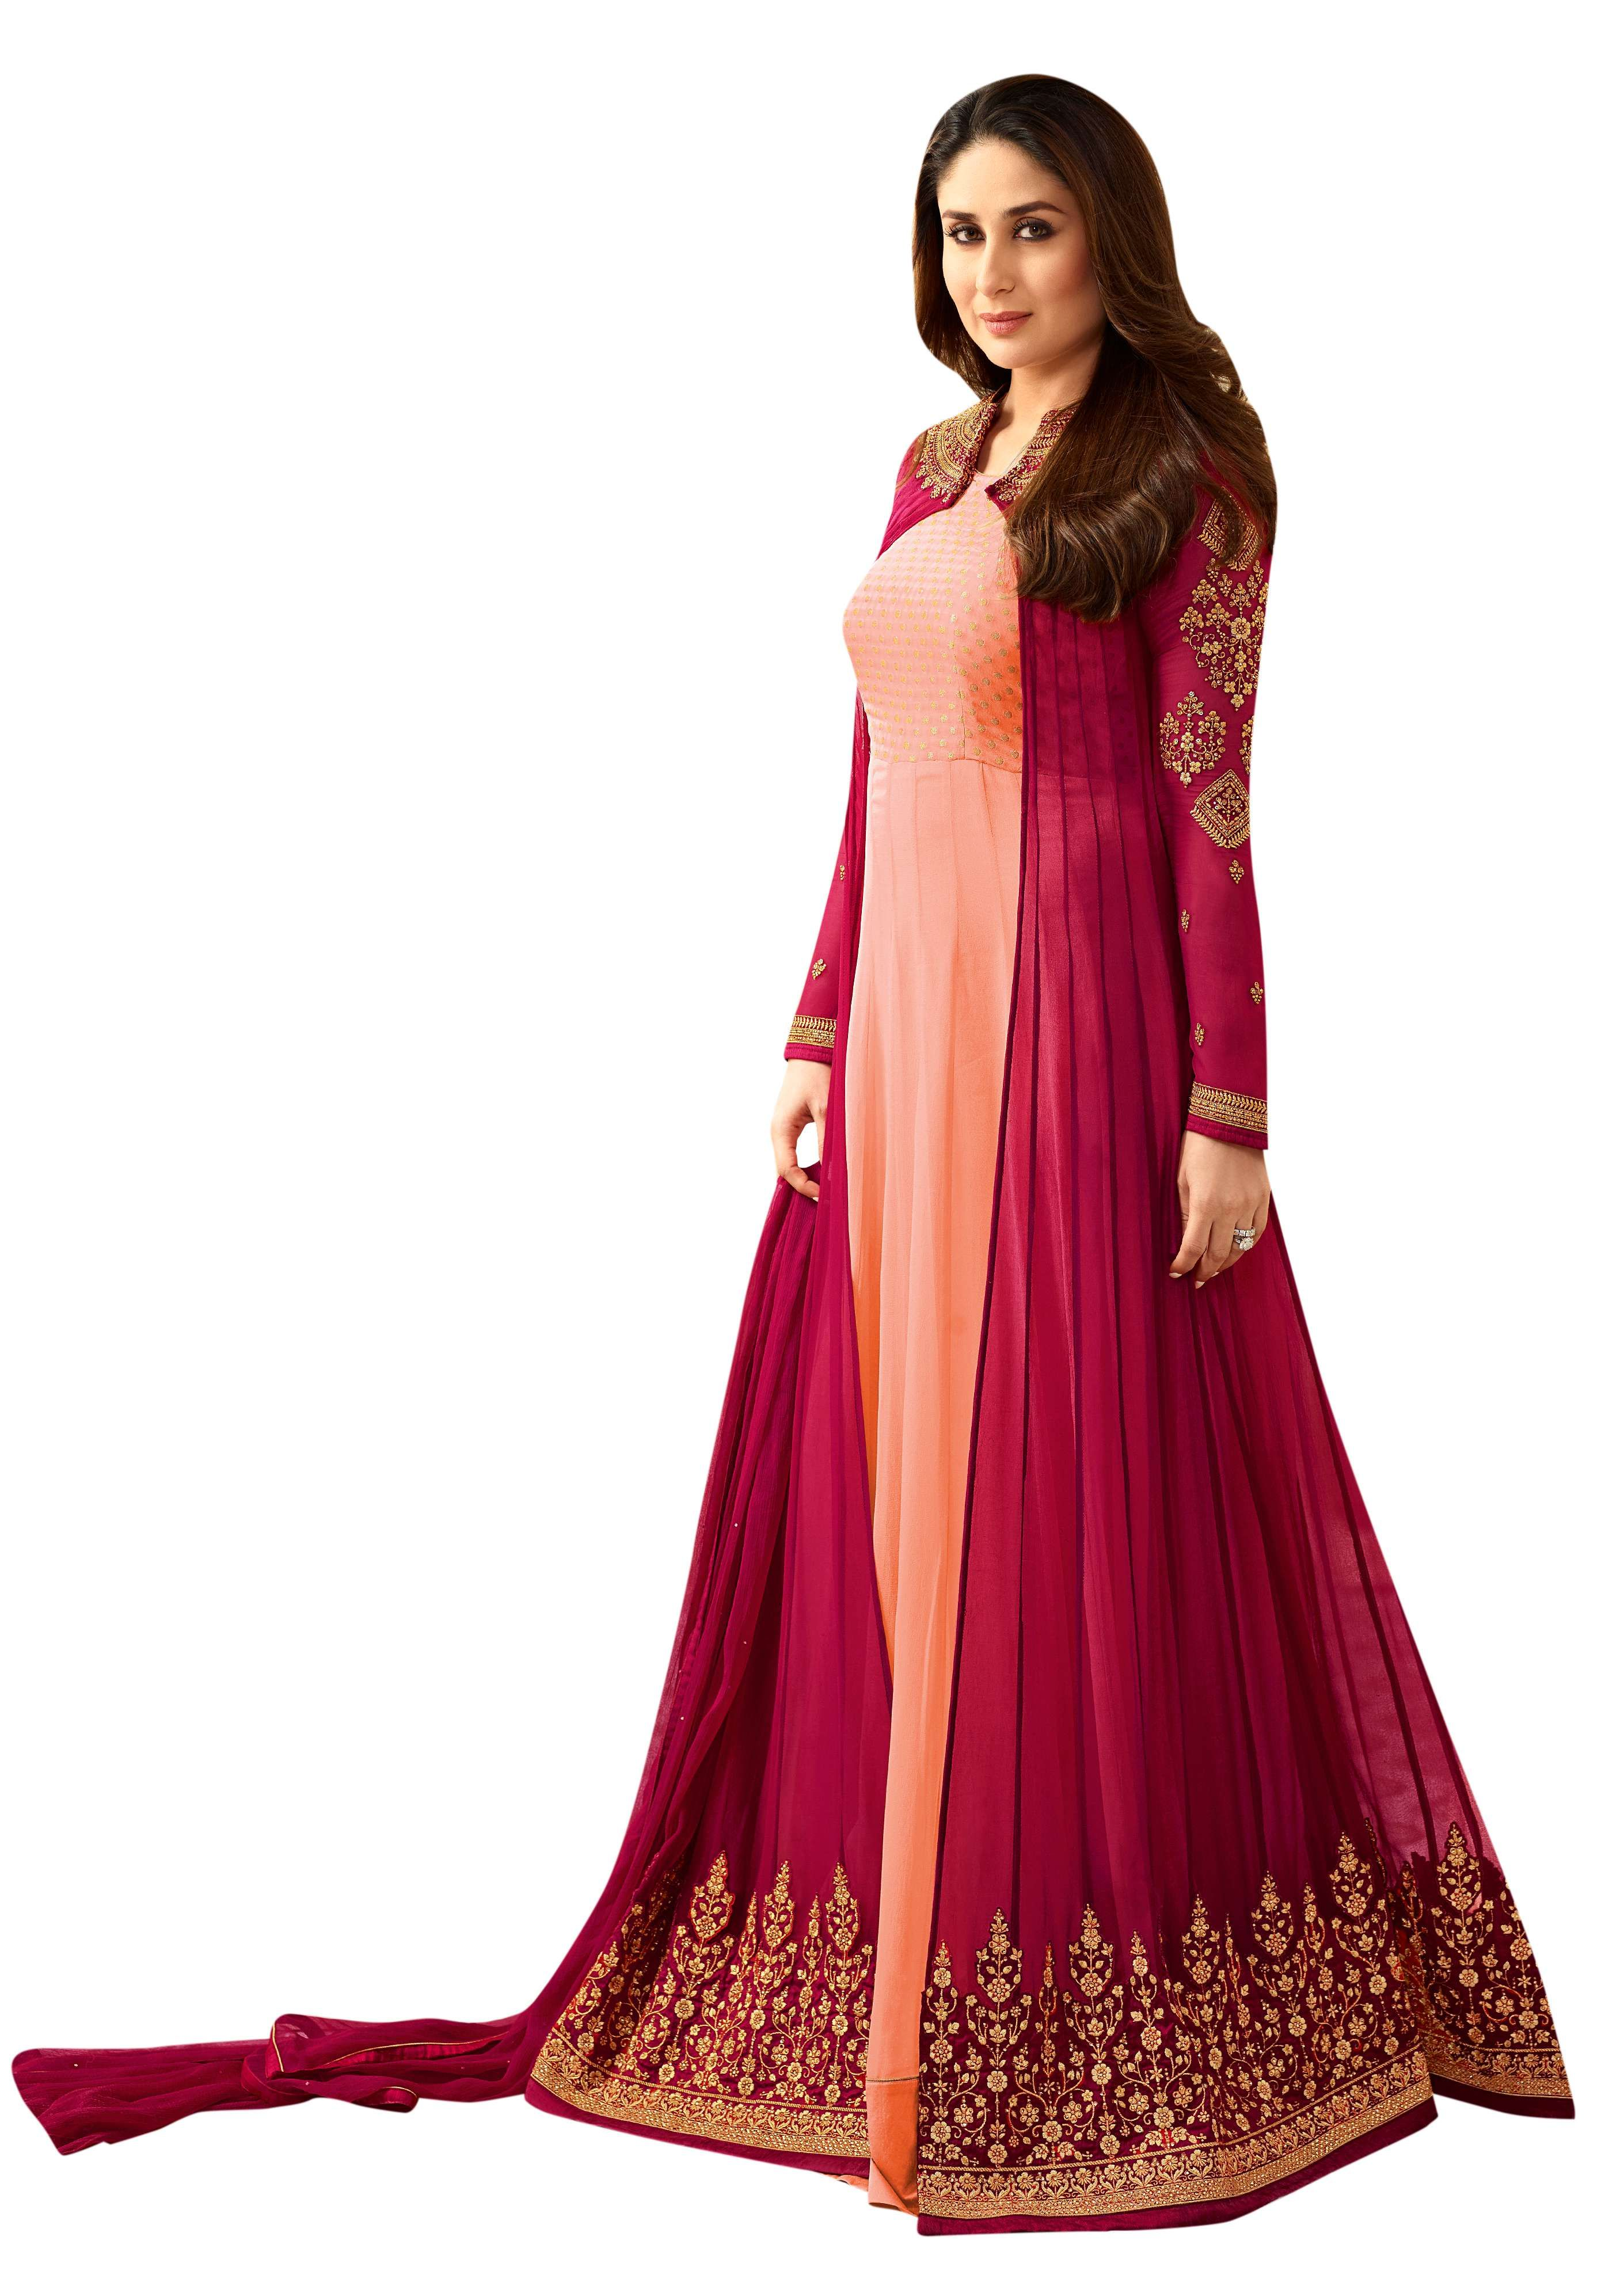 db7892f879 Pink Georgette Embroidered Jacket Style Anarkali Suit | Anarkali ...